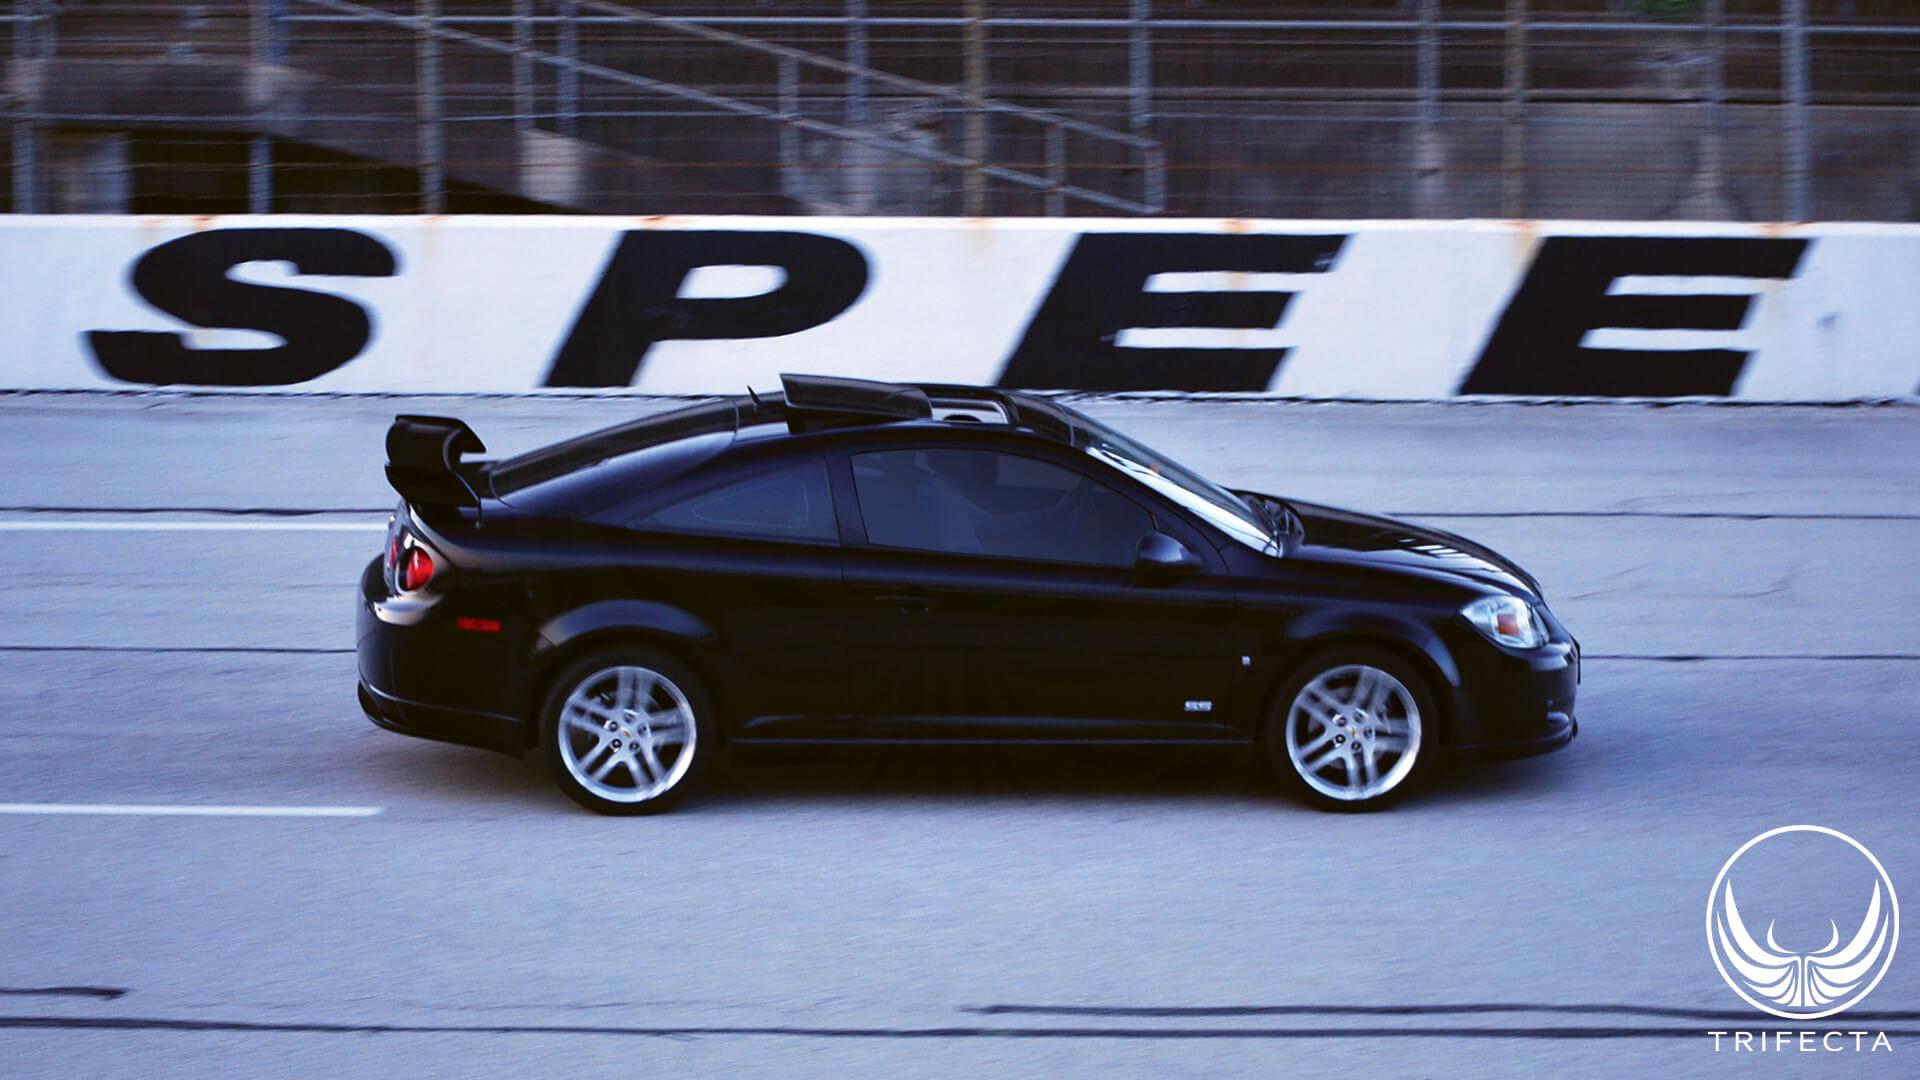 Product Review: 2008--2010 Chevrolet Cobalt - 2.0L Turbo